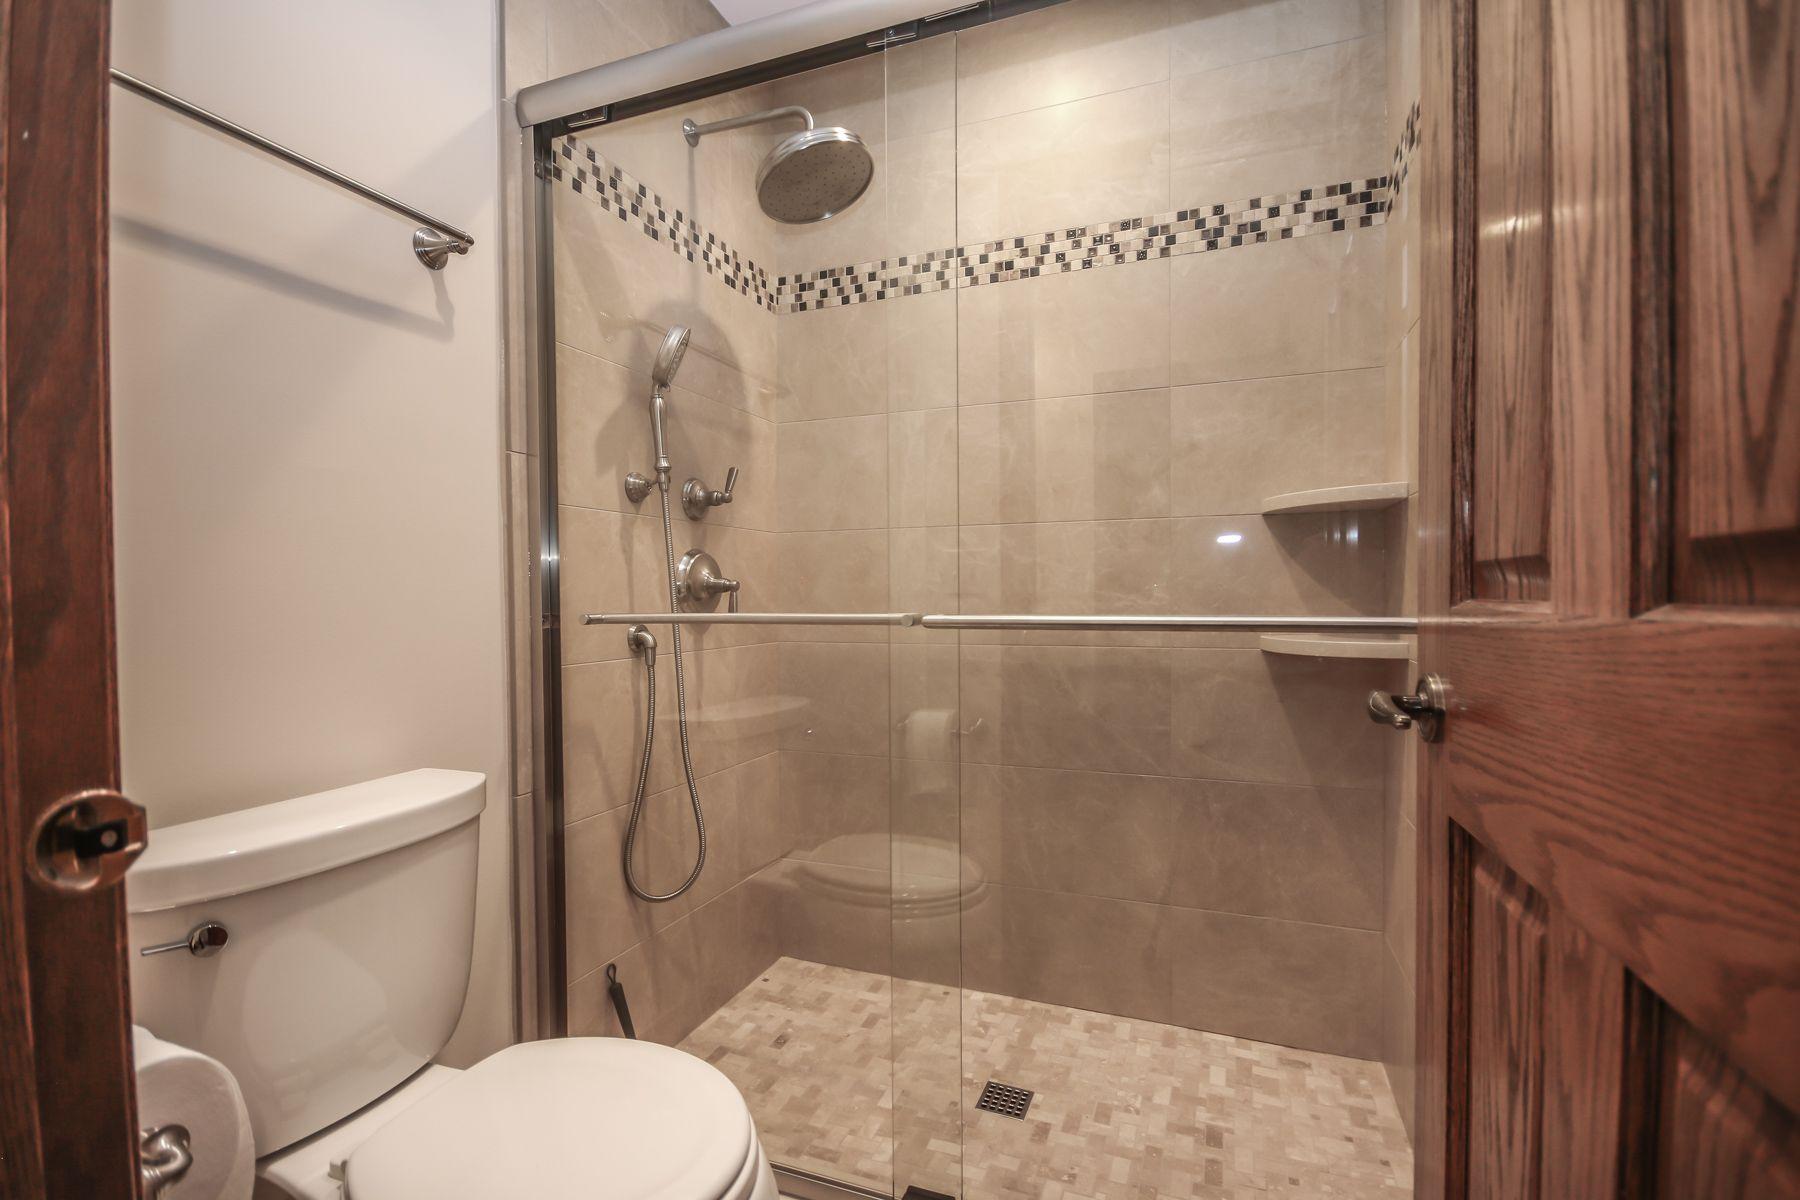 Before After Bathroom Remodels 3 Baths Bathroom Idea Videos Bathroom Design Bathrooms Remodel